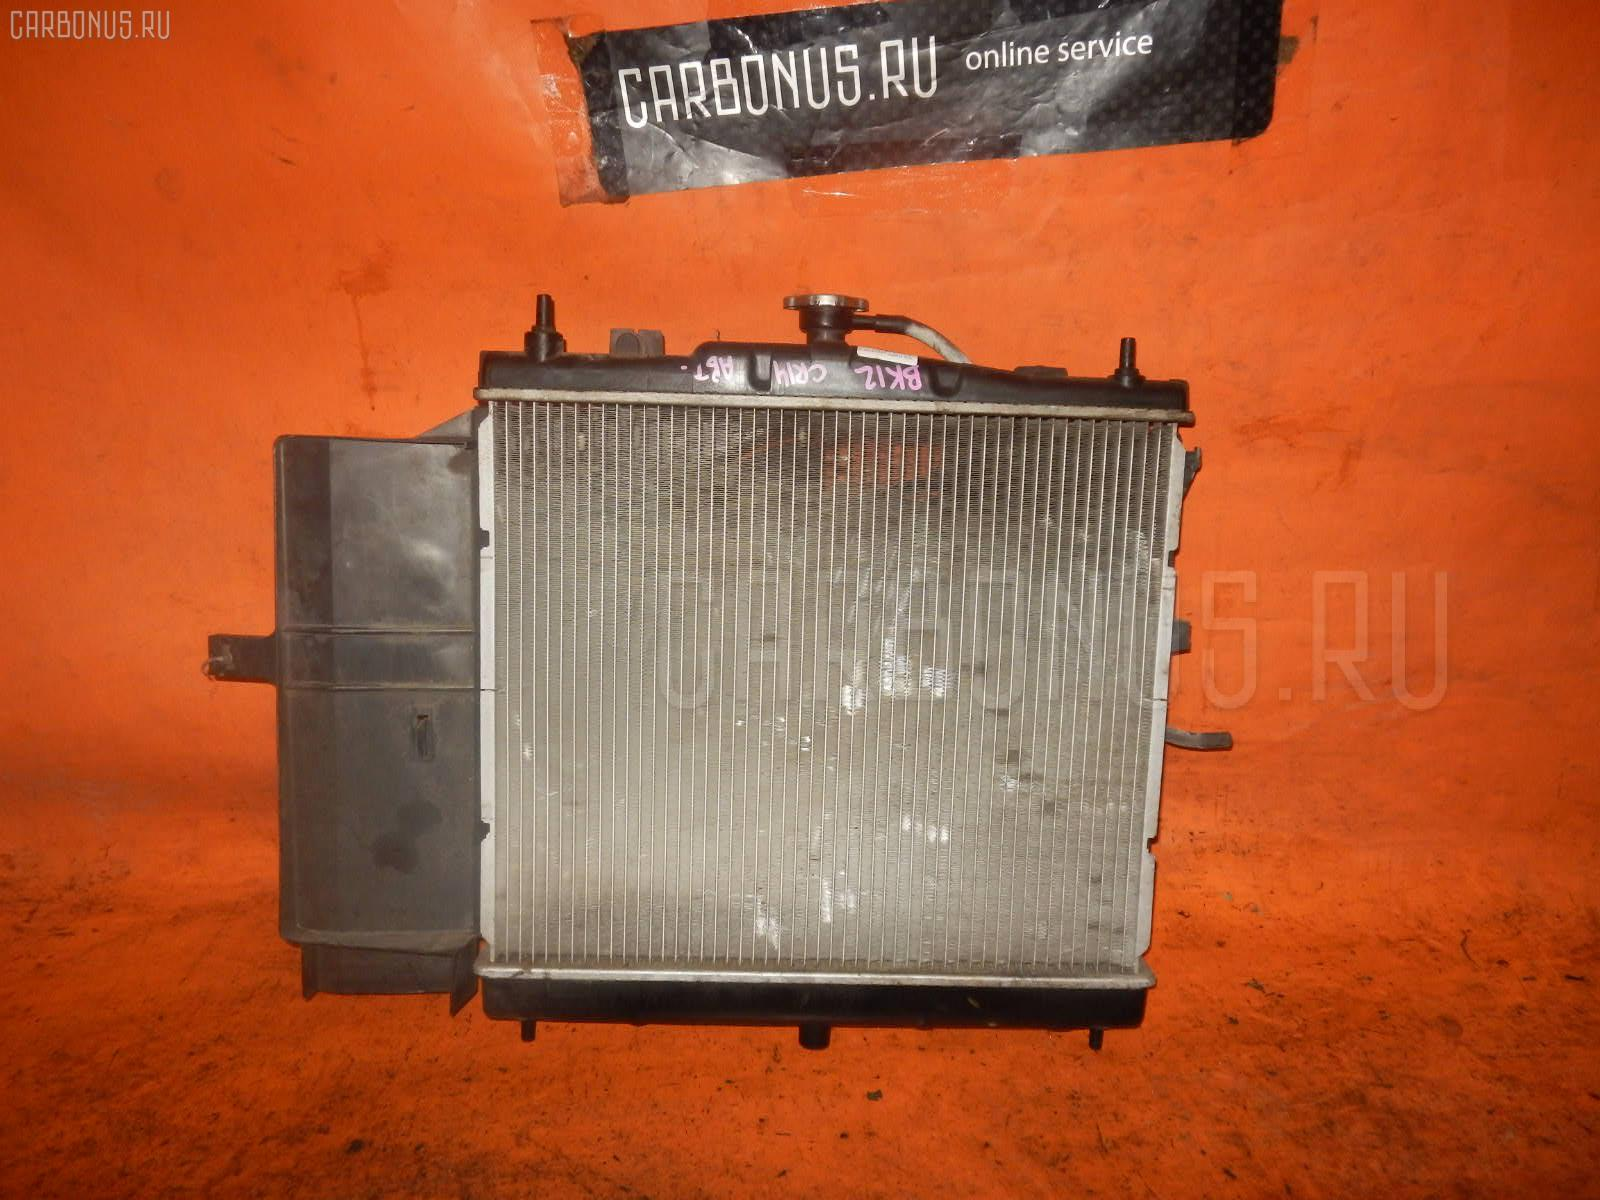 Радиатор ДВС NISSAN MARCH BK12 CR14DE. Фото 2